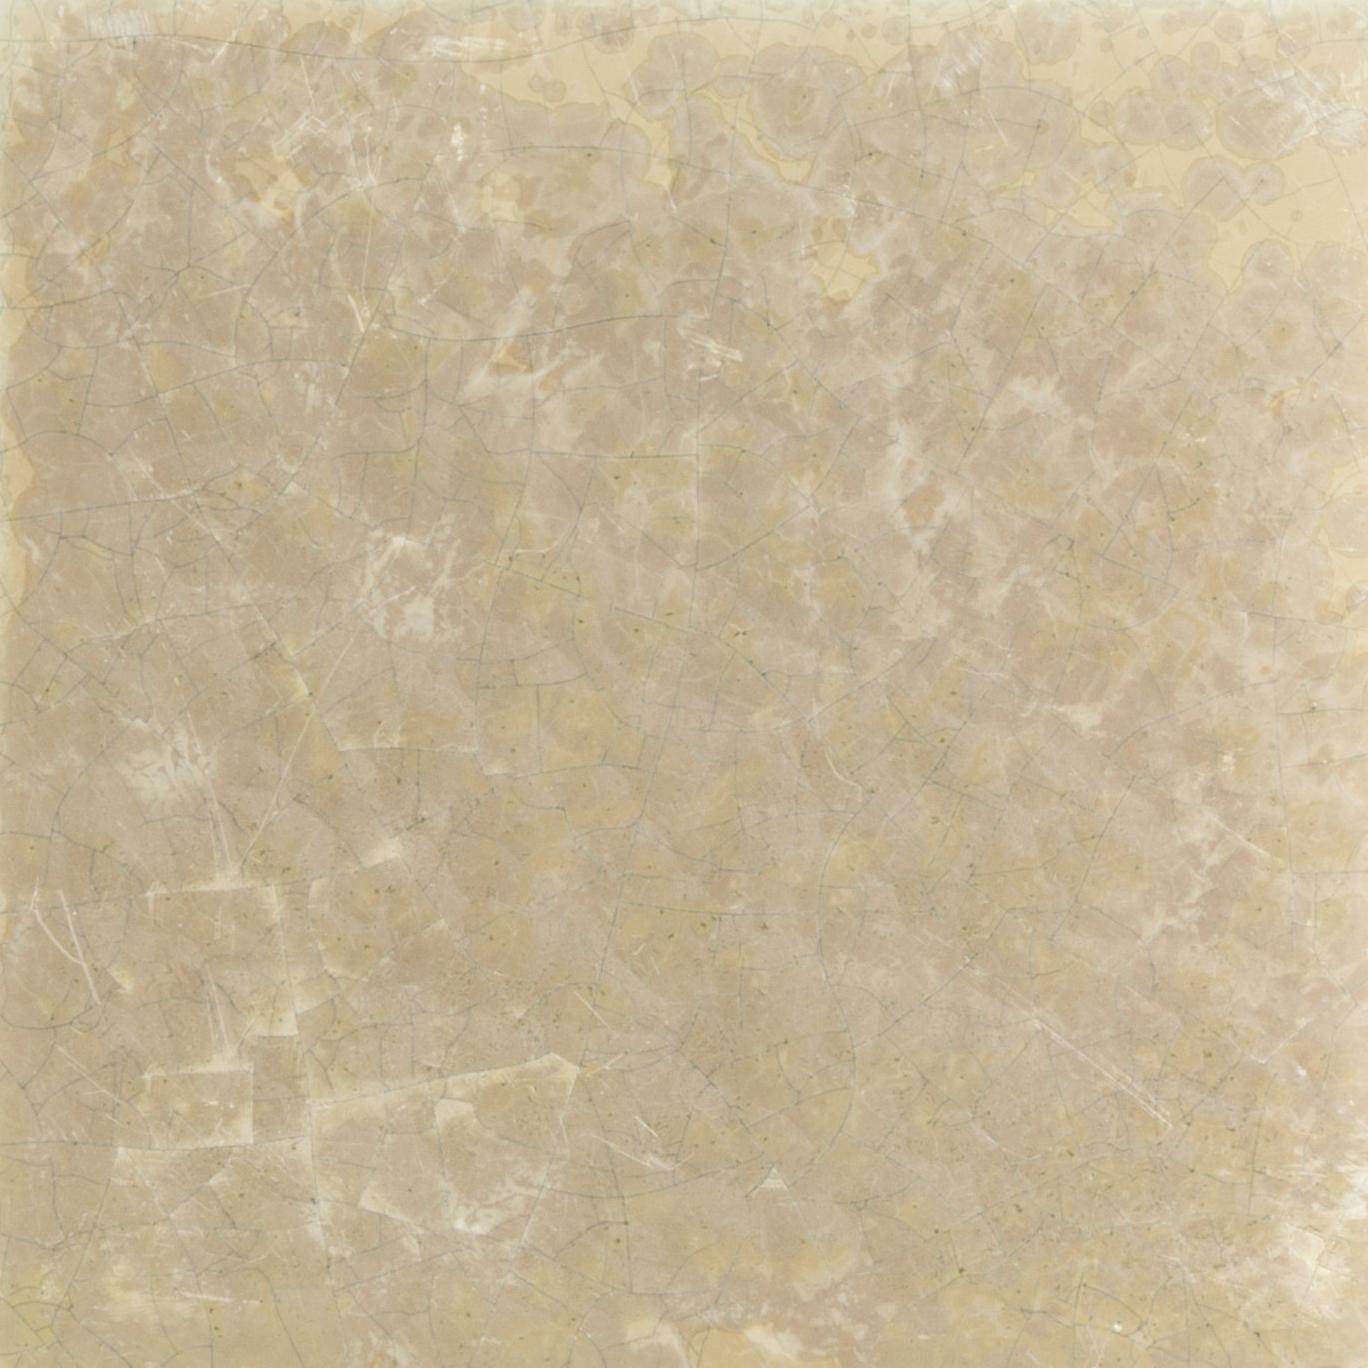 Sabbia-1.jpg